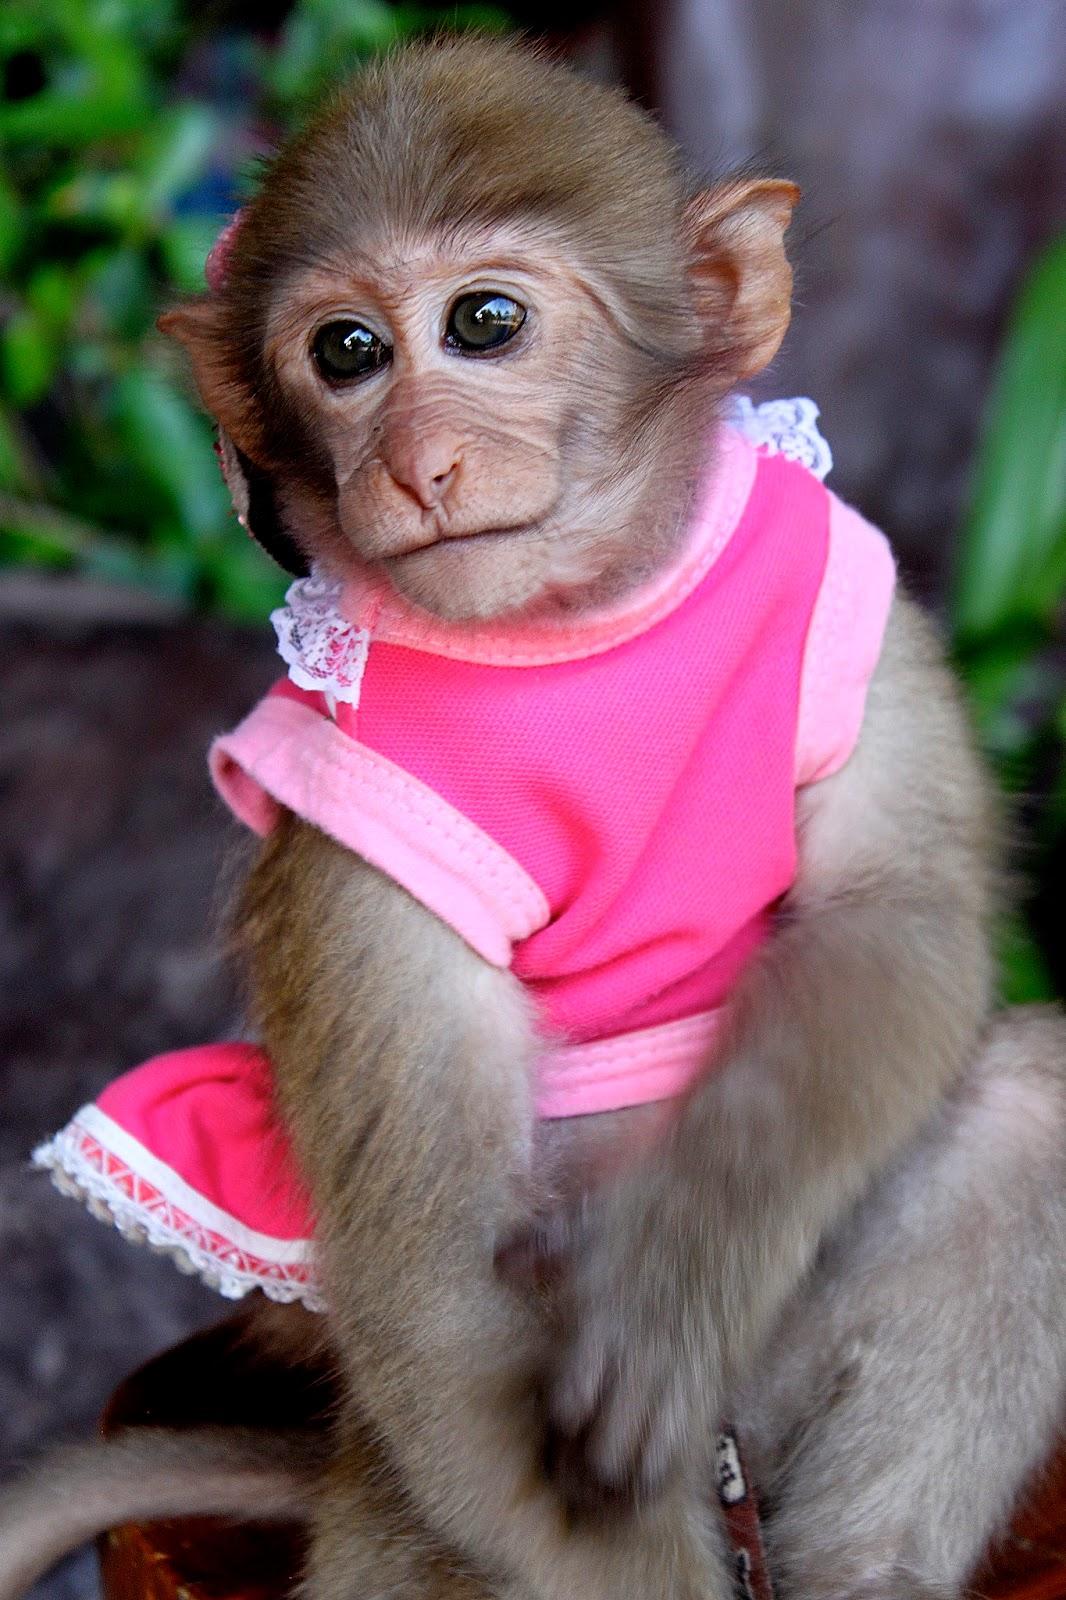 Baby Monkeys Dressed Up | www.pixshark.com - Images ...